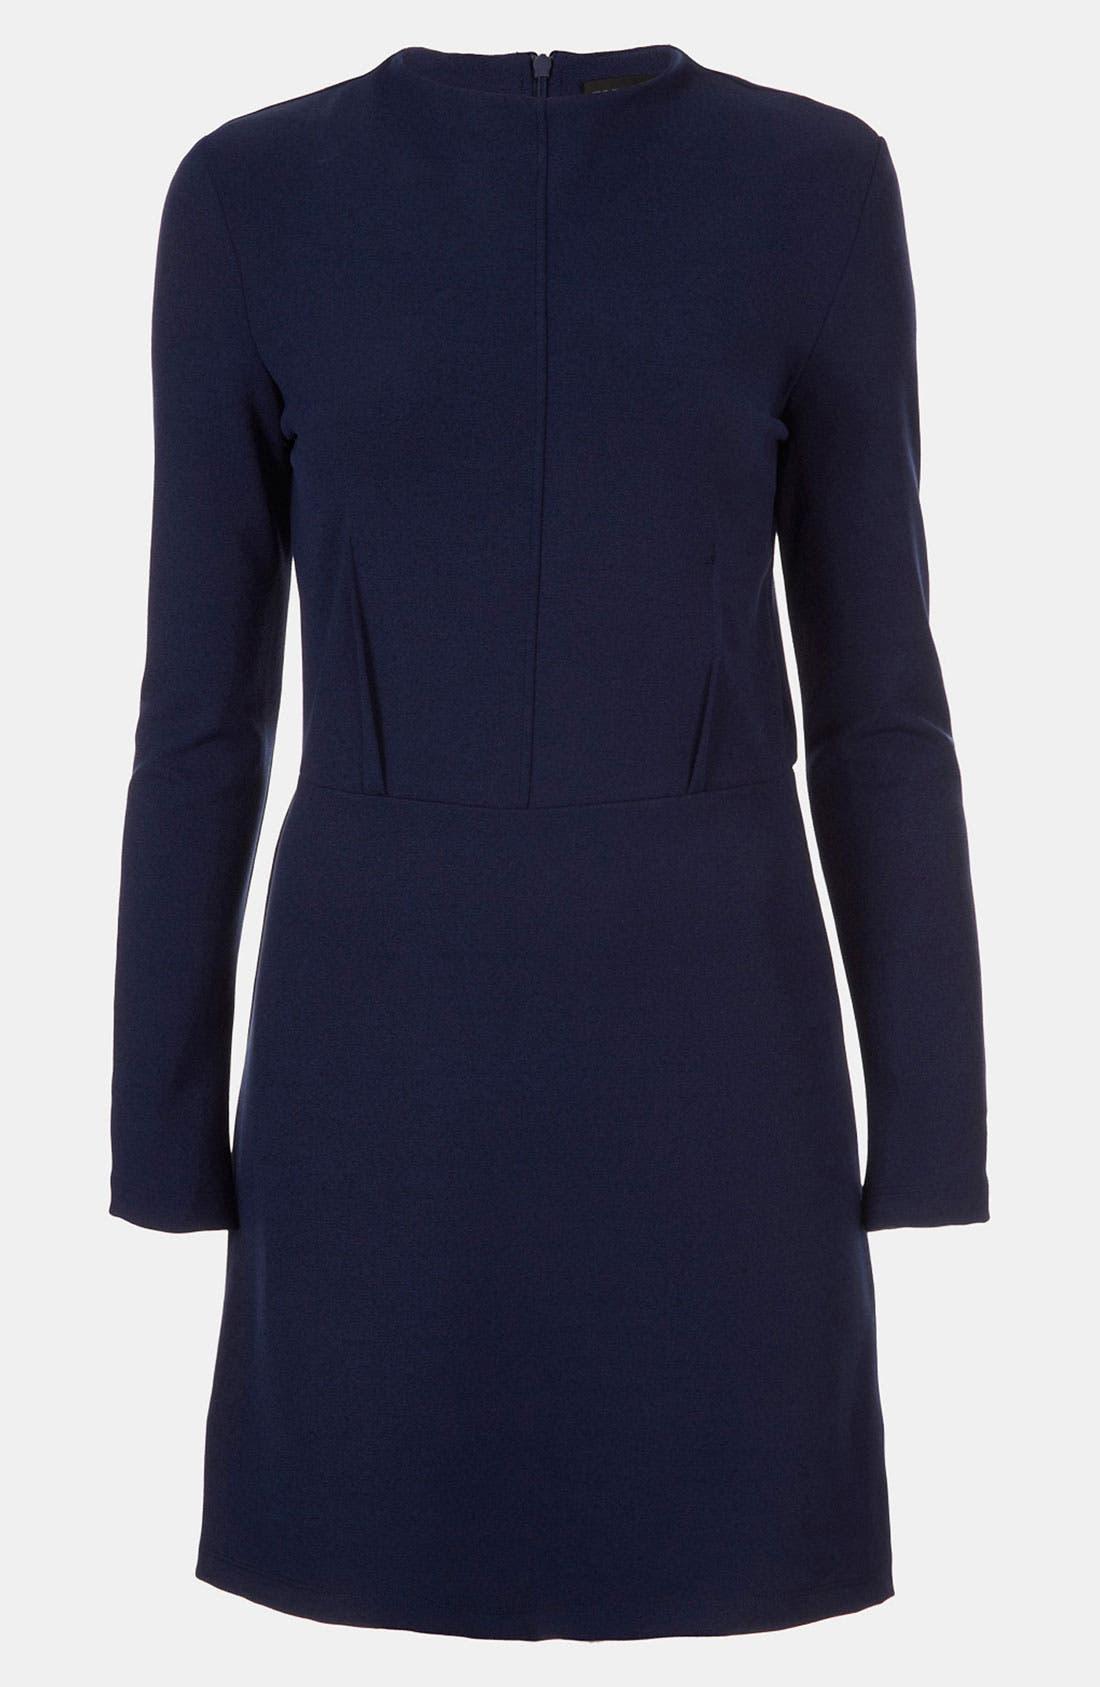 Alternate Image 1 Selected - Topshop High Neck Ponte Dress